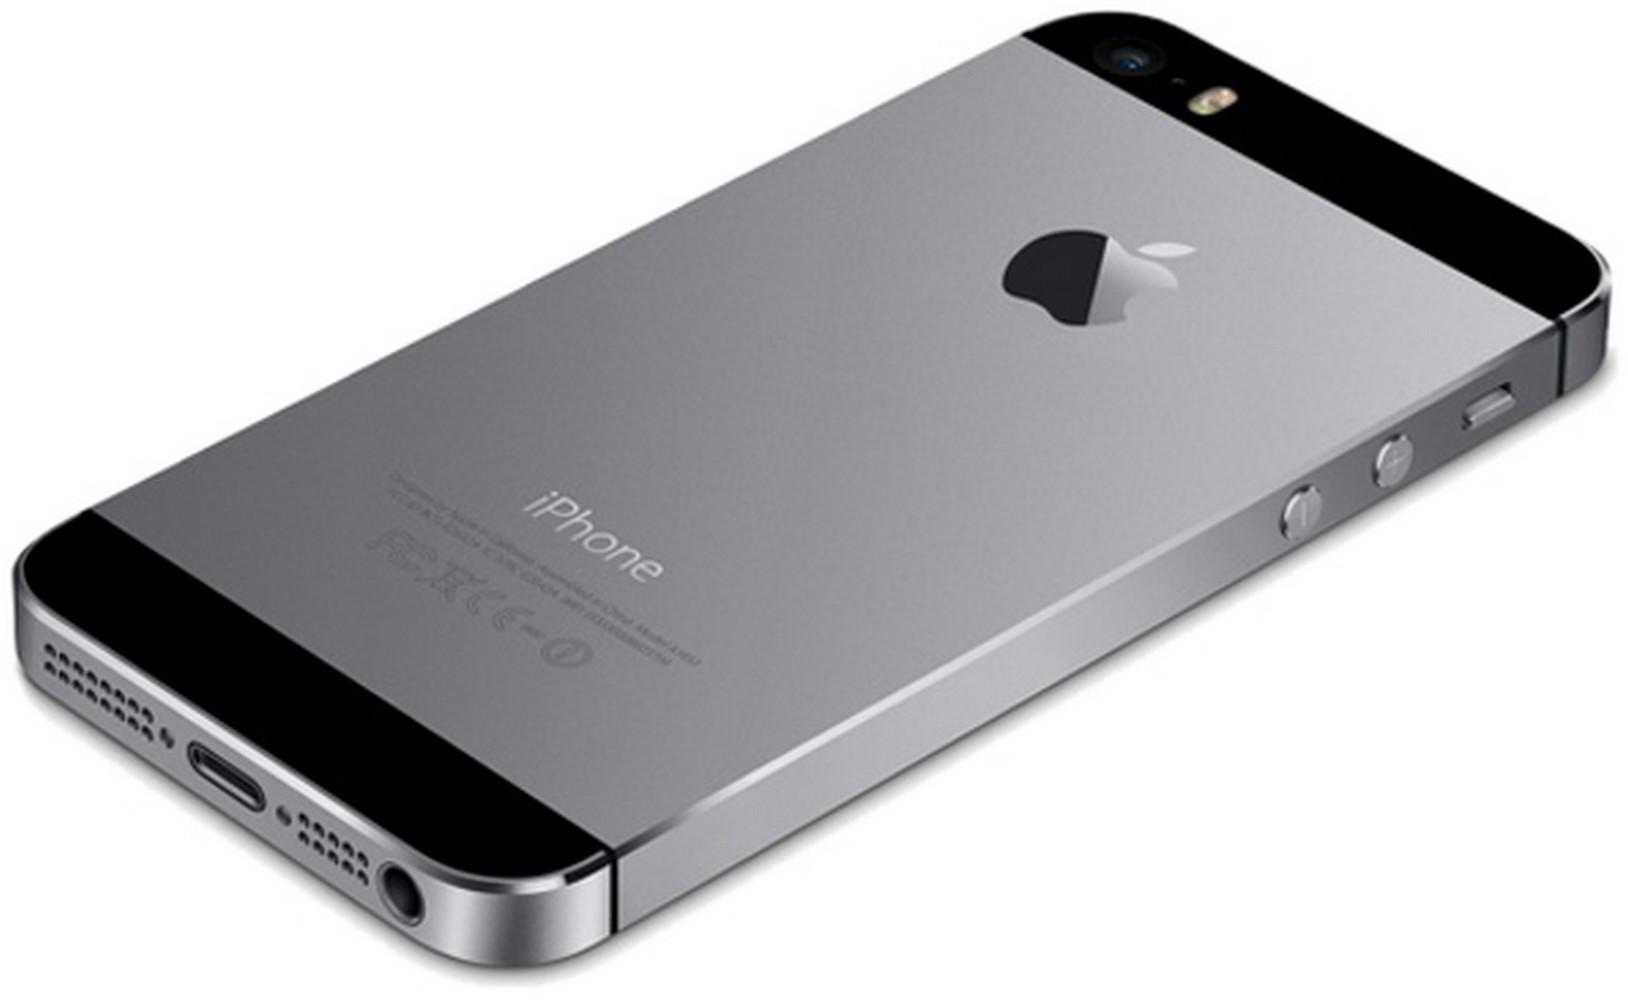 Apple-iPhone-5s-Unlocked-GSM-Unlocked-AT-amp-T-Verizon-T-Mobile-A1533 thumbnail 12